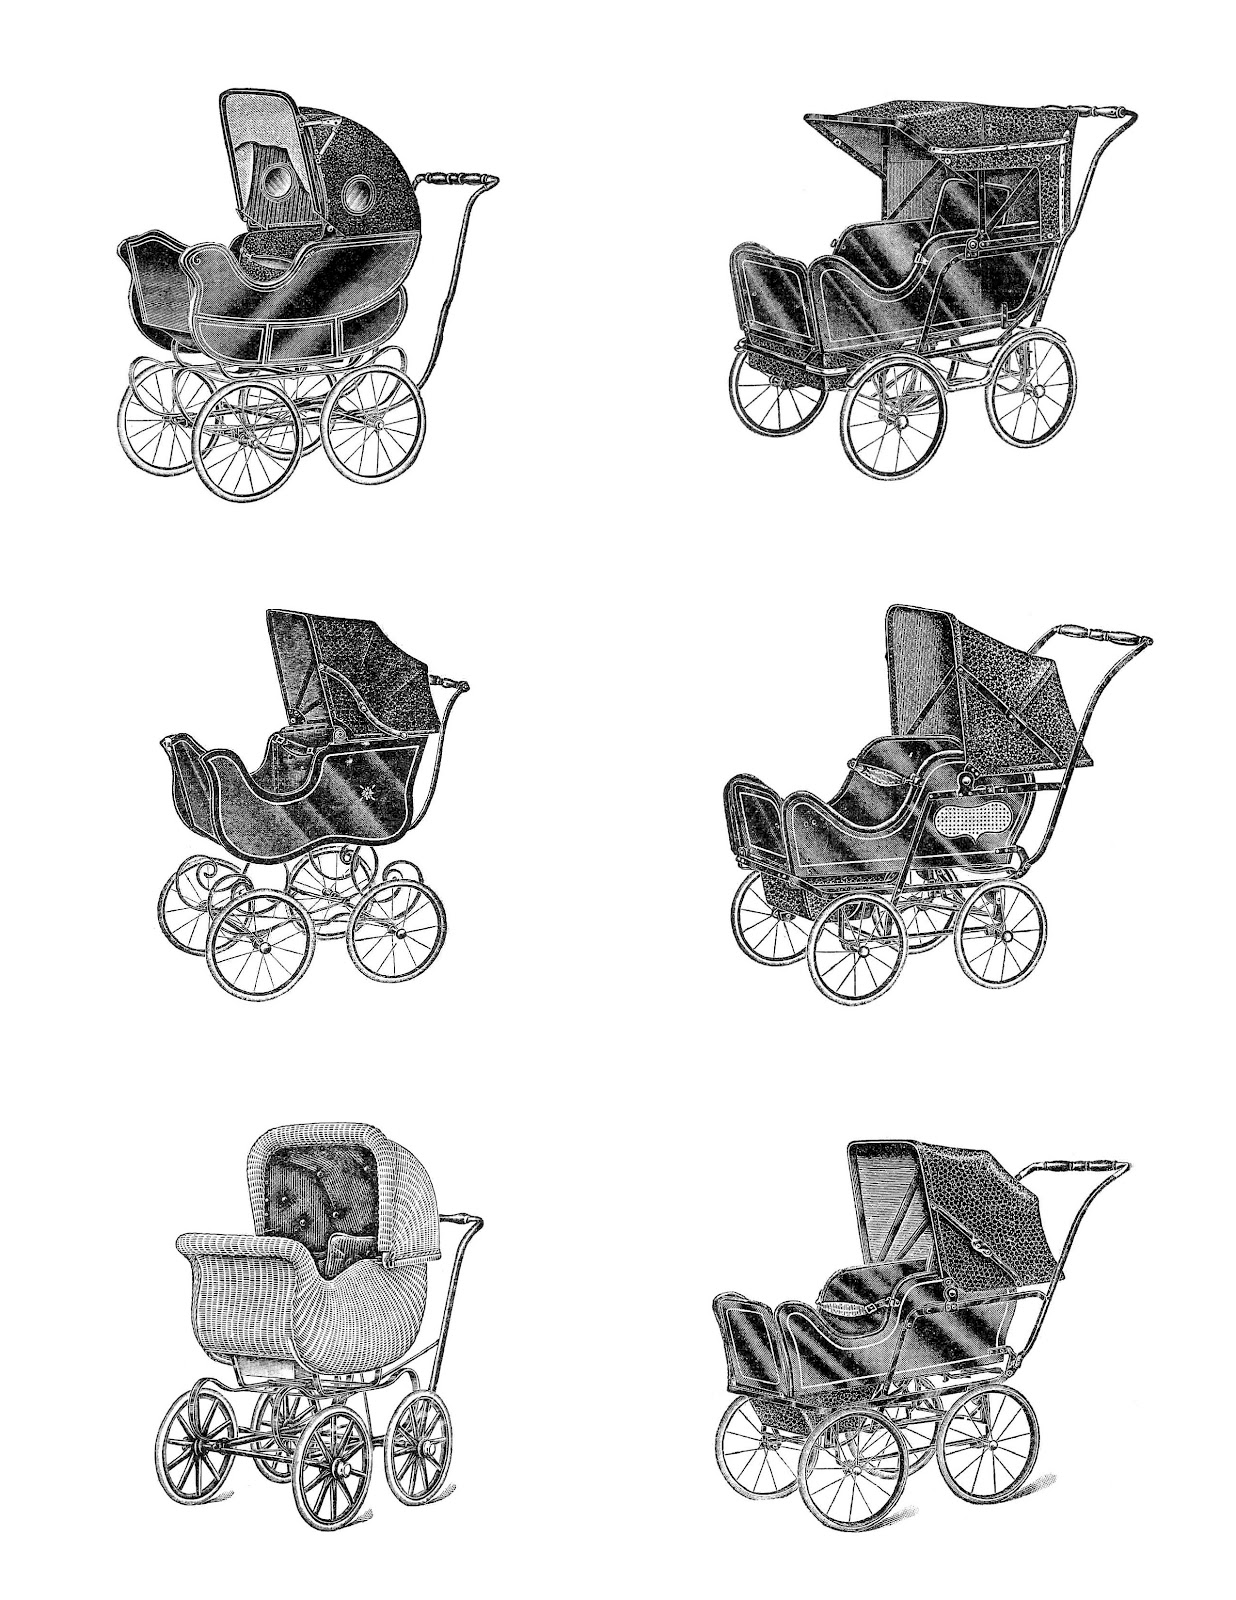 Antique Images Digital Collage Sheet 6 Vintage Baby Carriage Illustrations